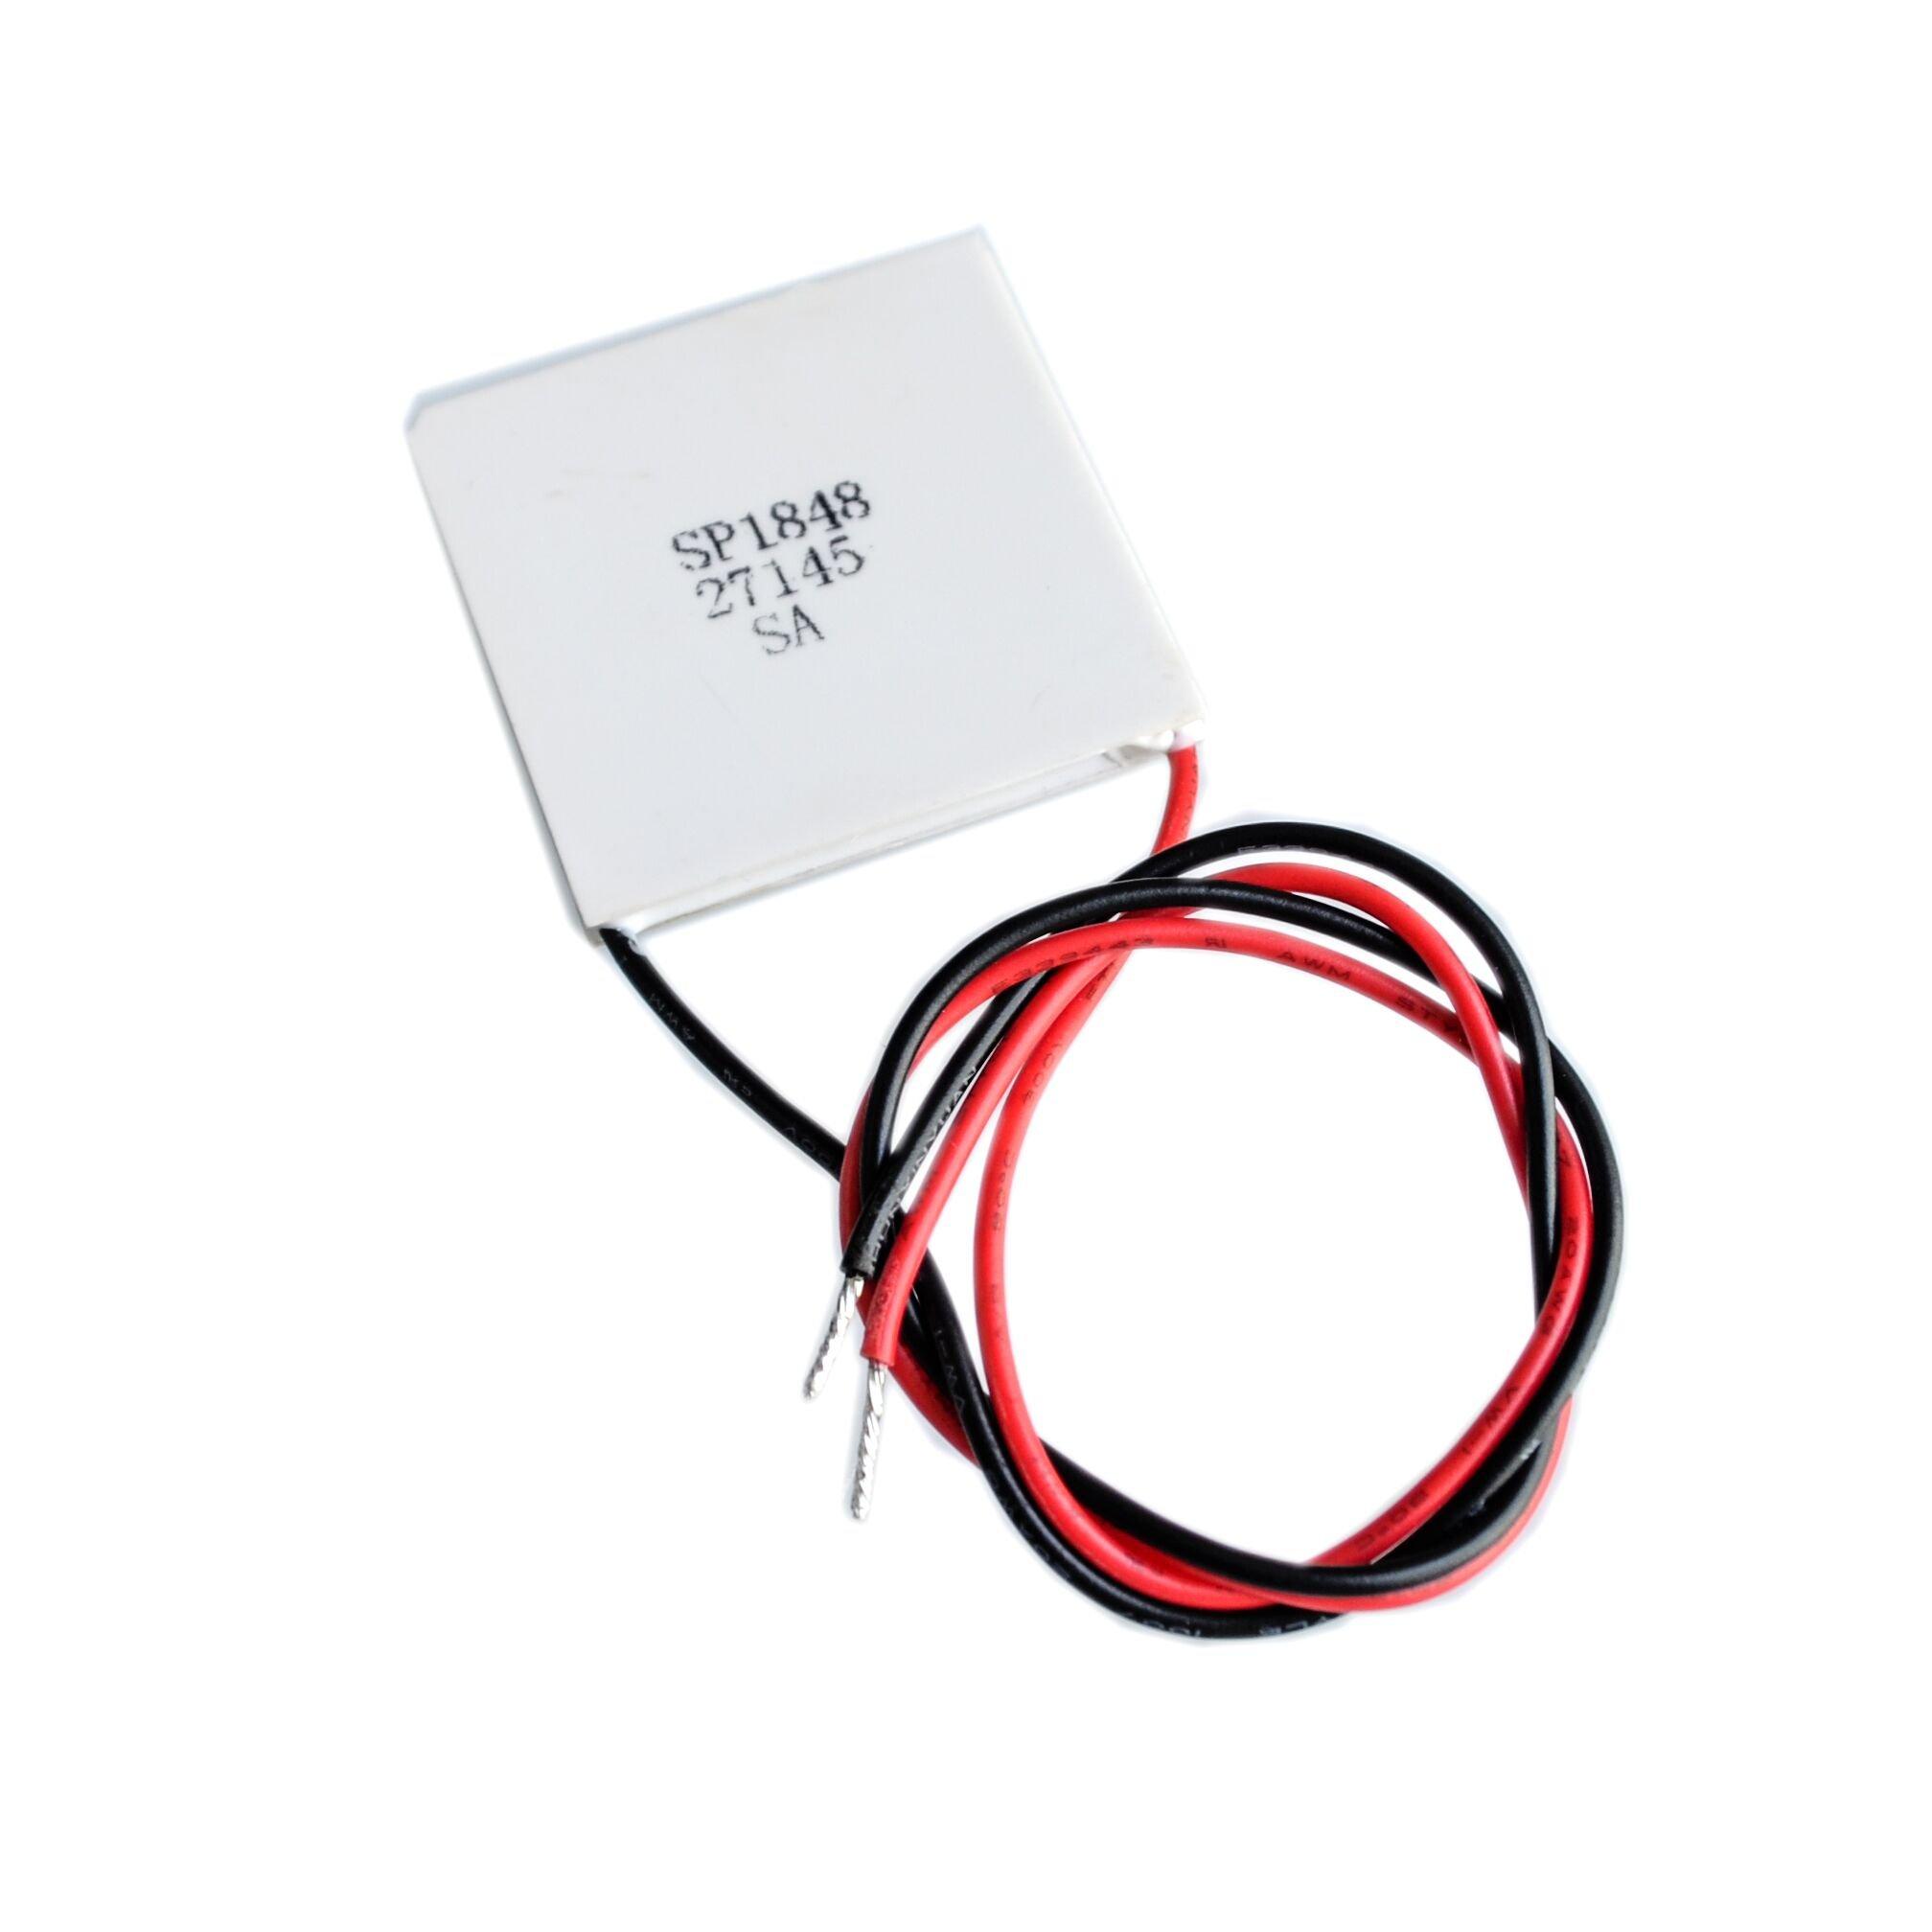 Seajunn 10PCS/LOT SP1848-27145 TEC 40x40mm Semiconductor Thermoelectric Heatsink Cooler Peltier Plate Module For Power Generation